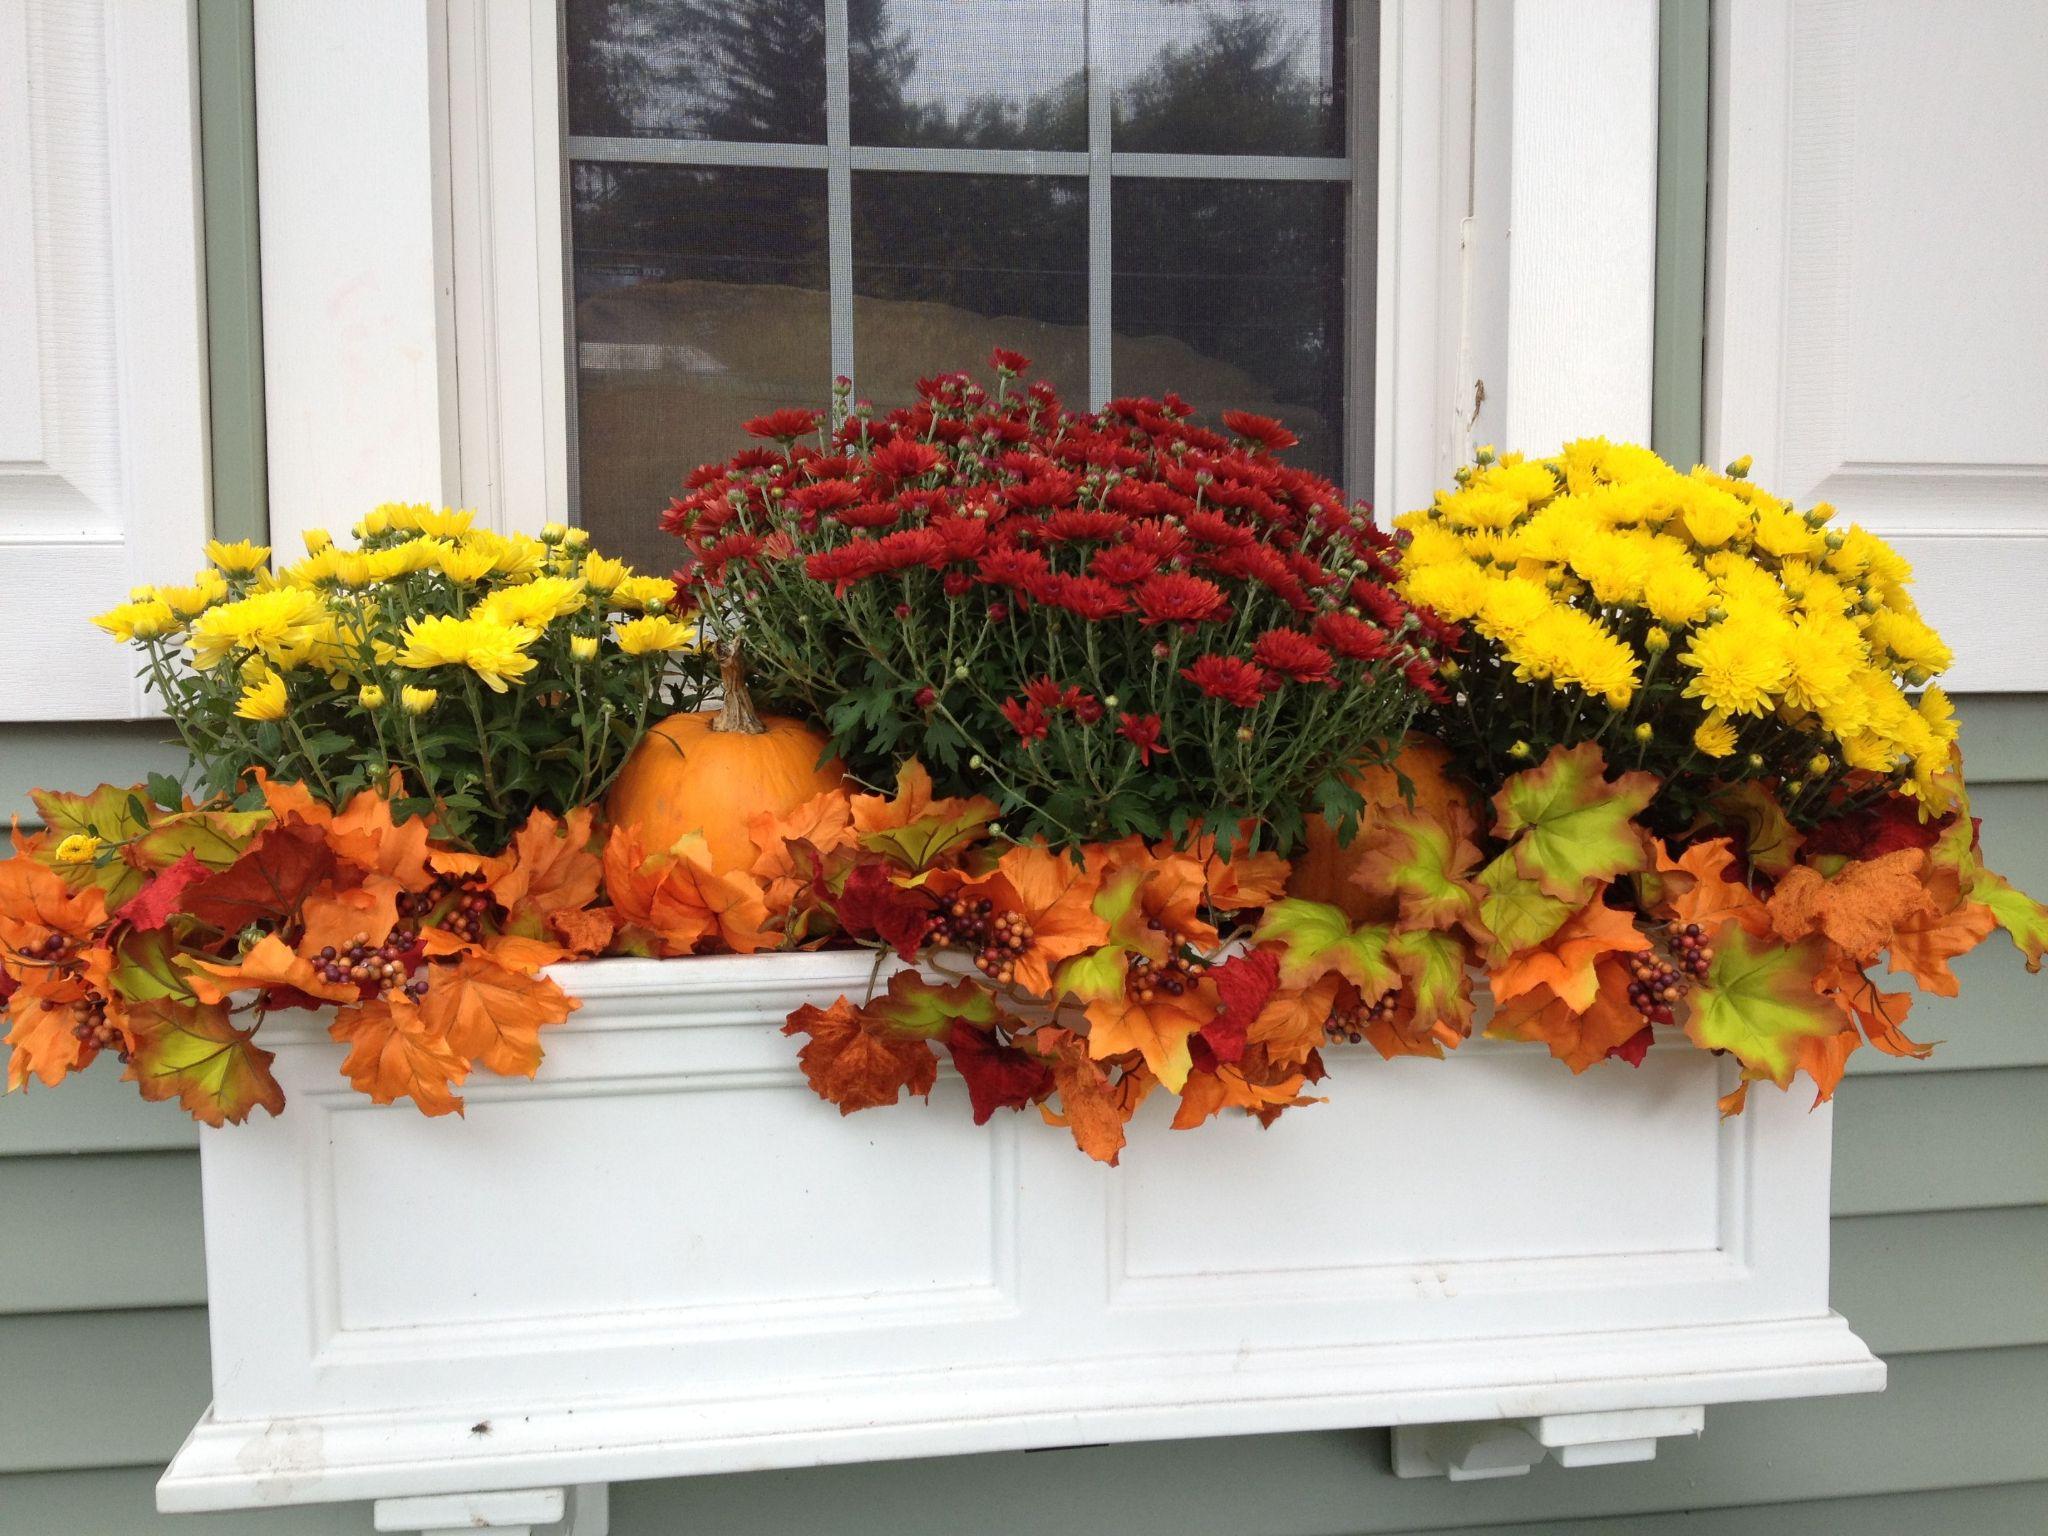 Tips for a Beautiful Fall Window Box Display